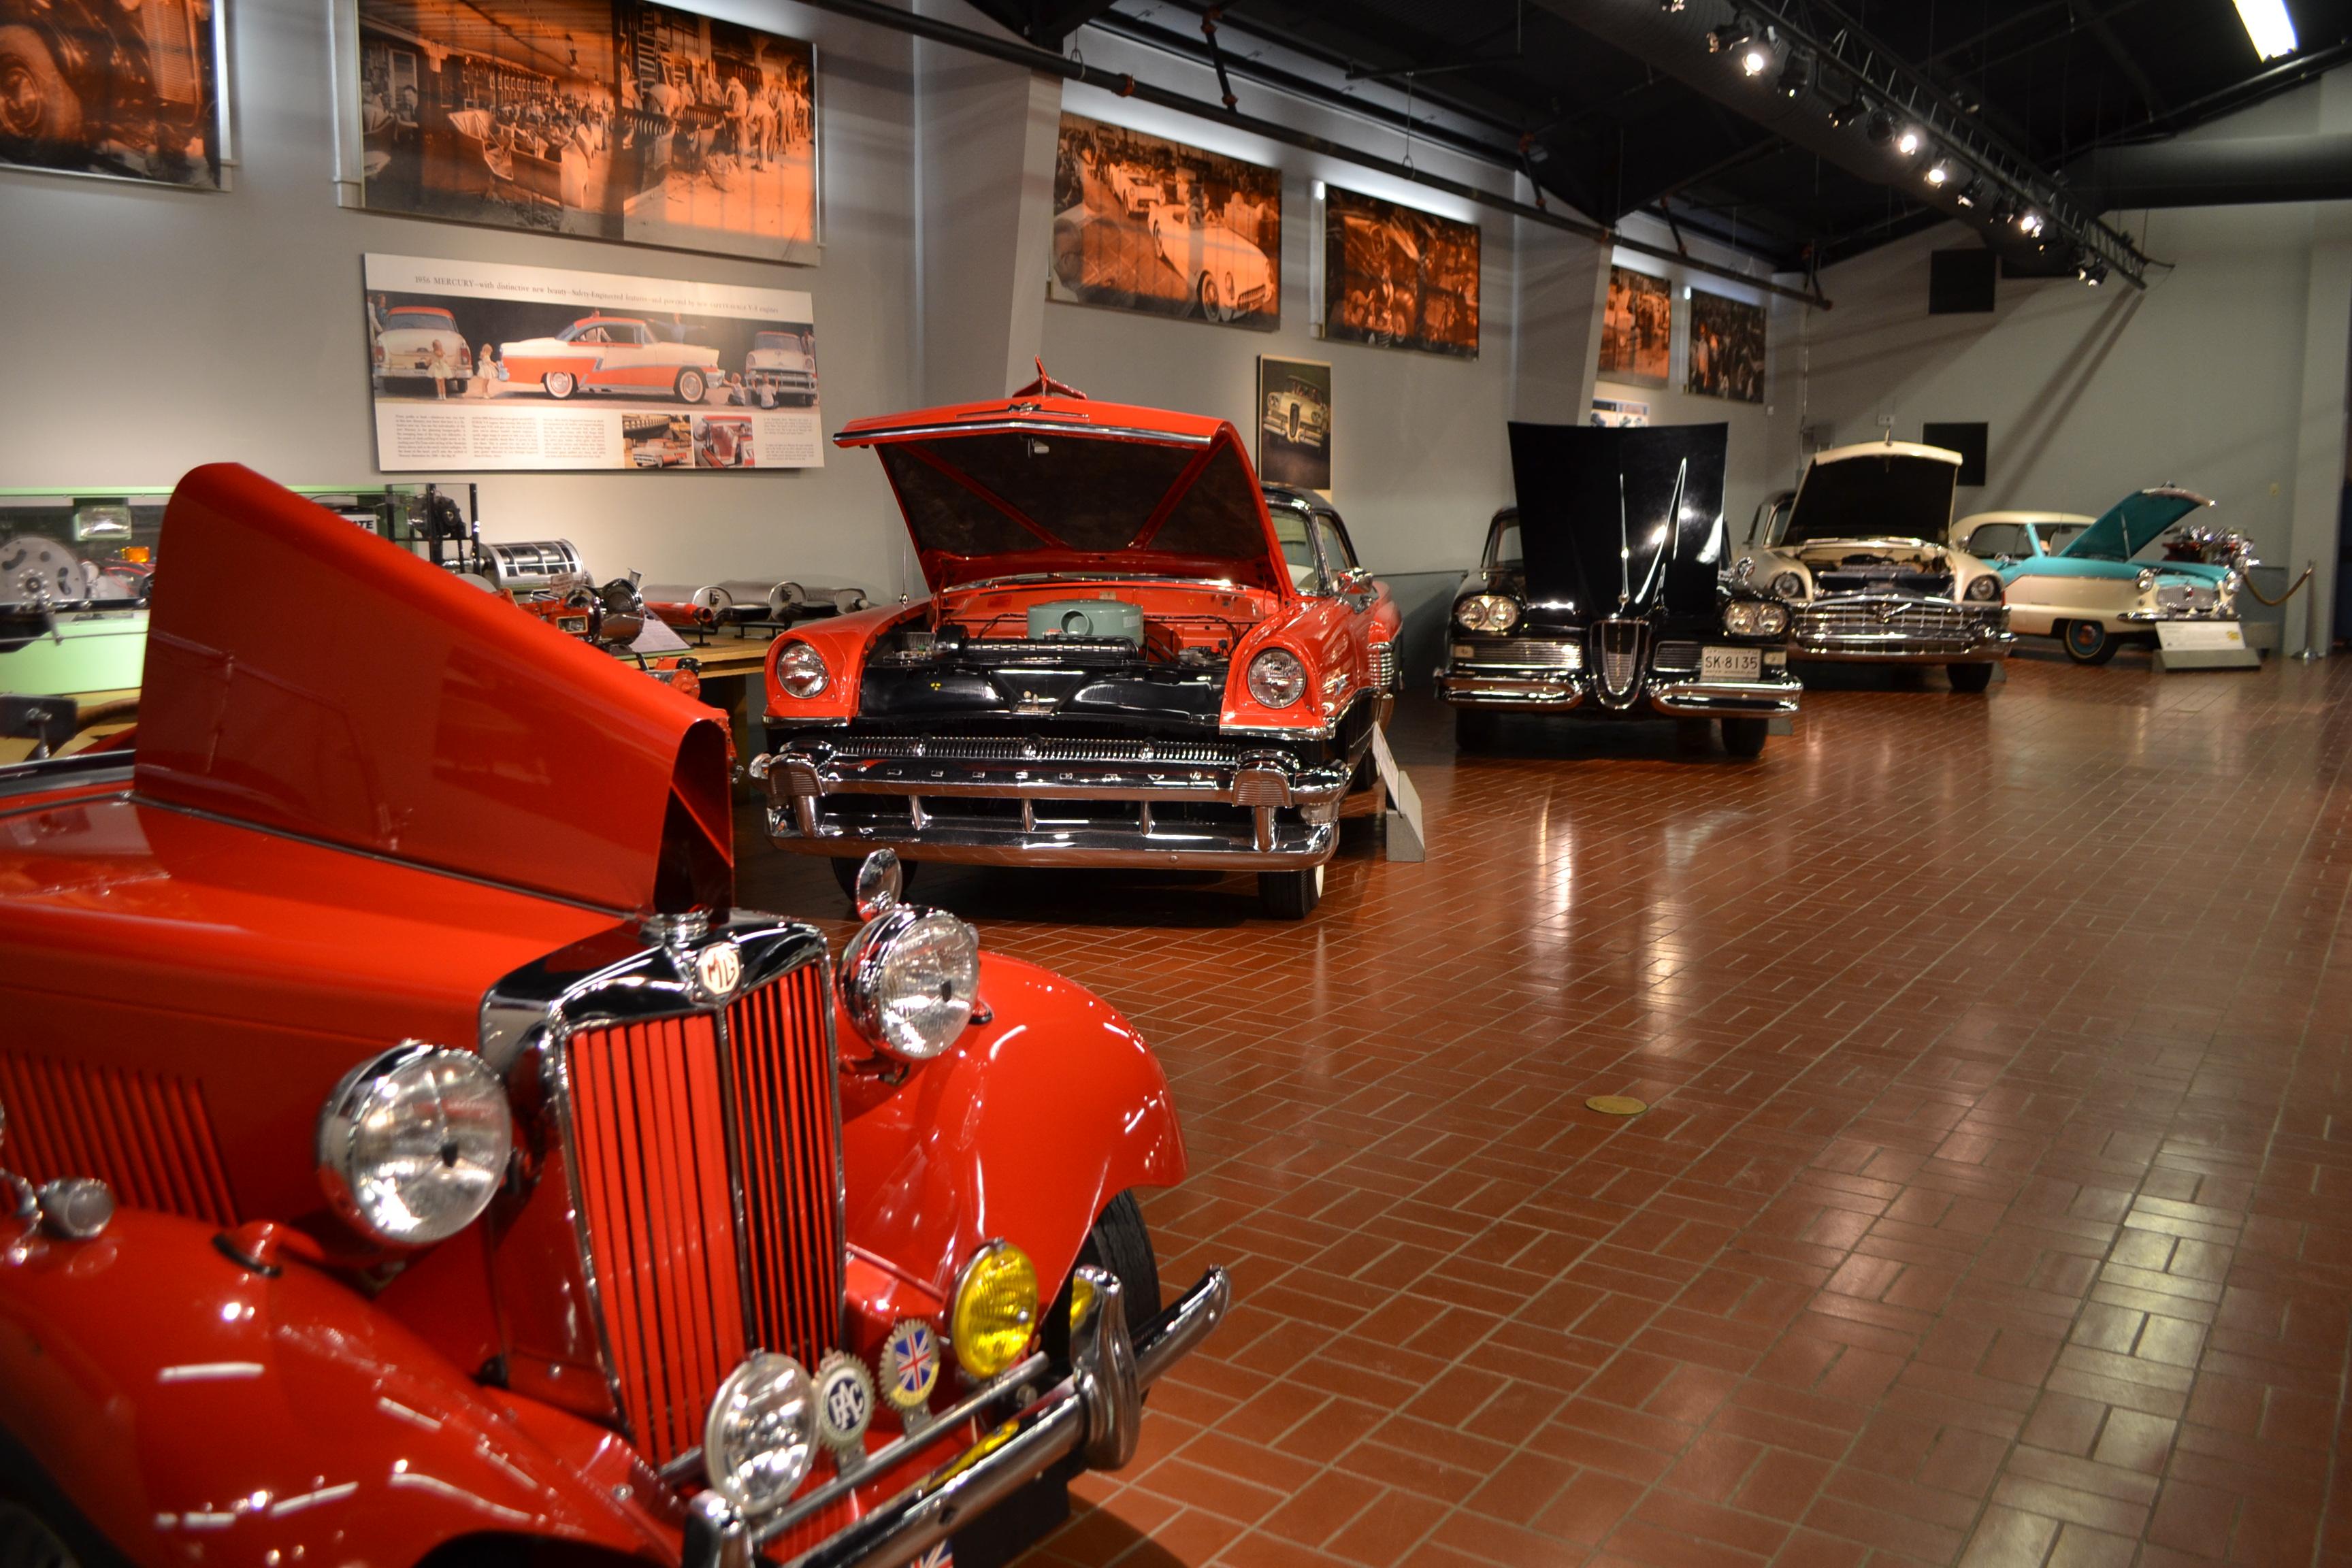 Reverse art show, What's the car equivalent of 'reverse' art show?, ClassicCars.com Journal